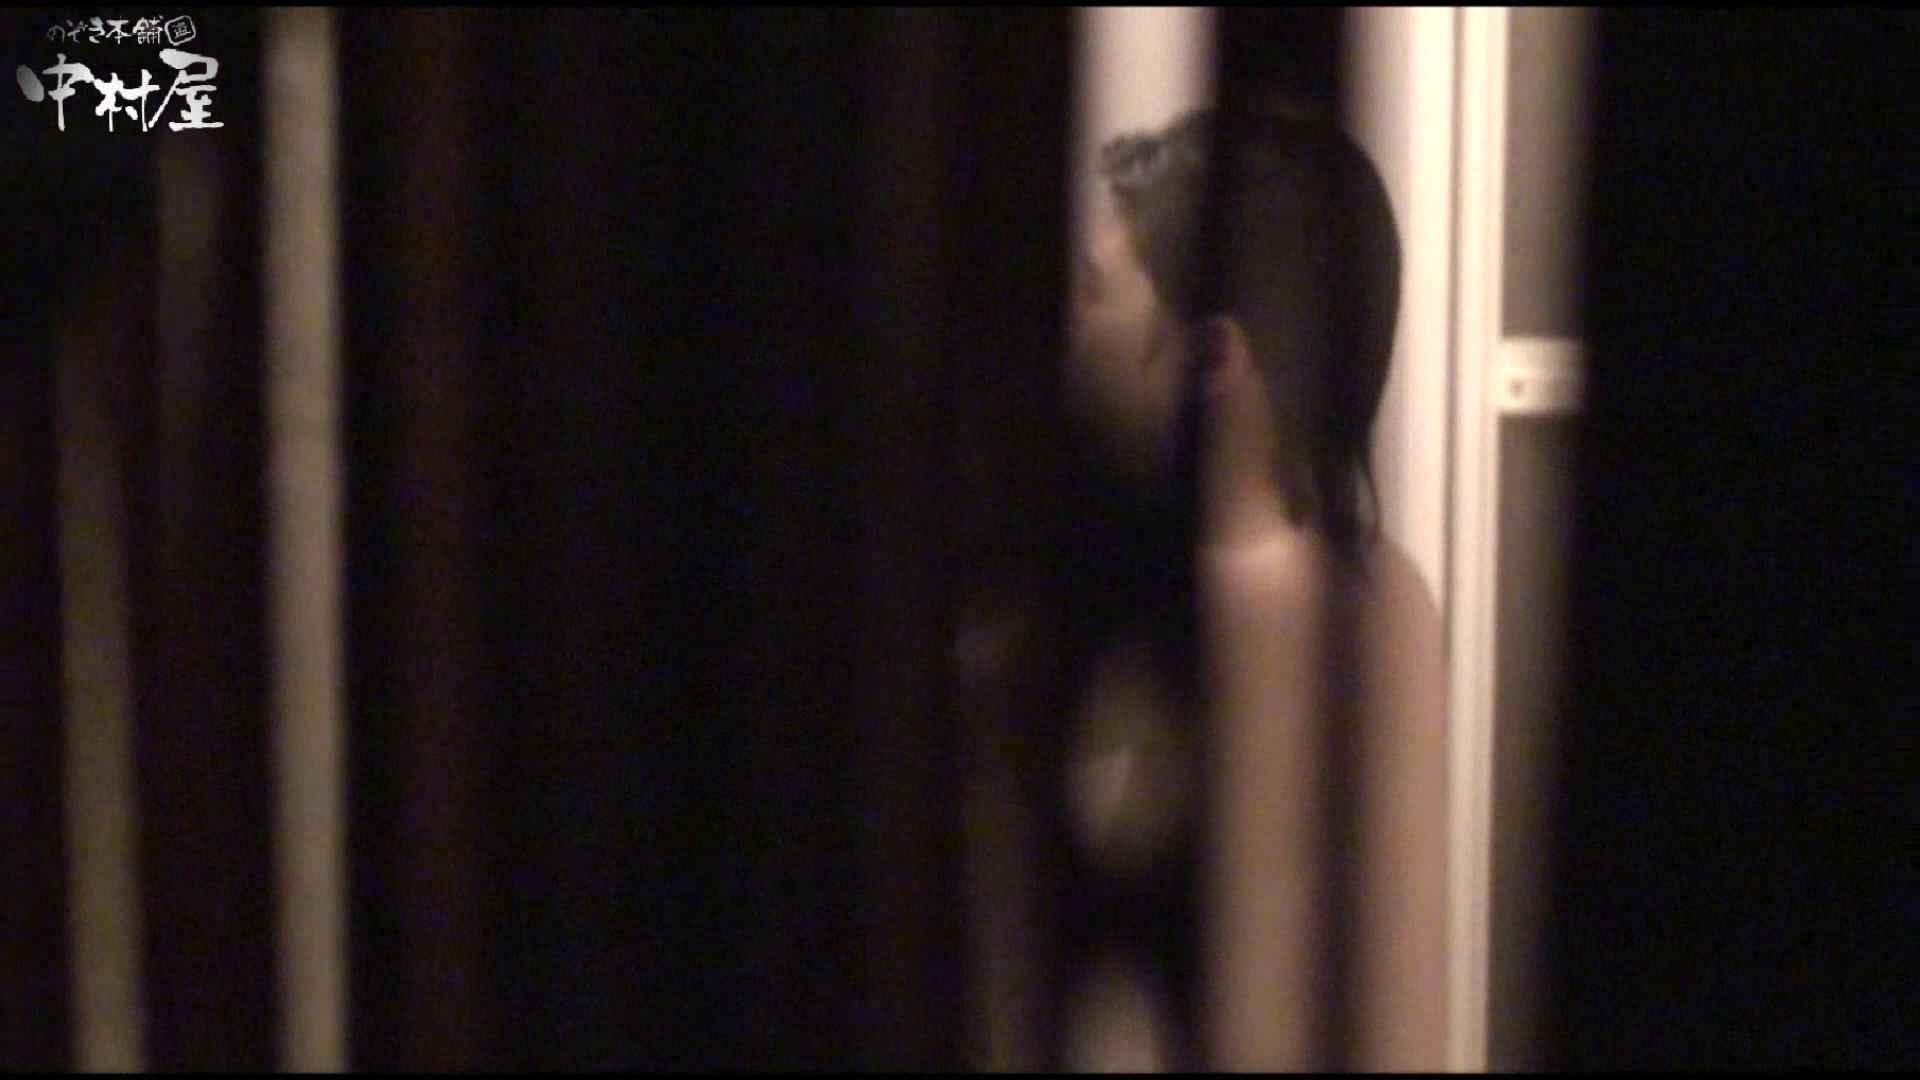 民家風呂専門盗撮師の超危険映像 vol.028 OLハメ撮り  28Pix 27